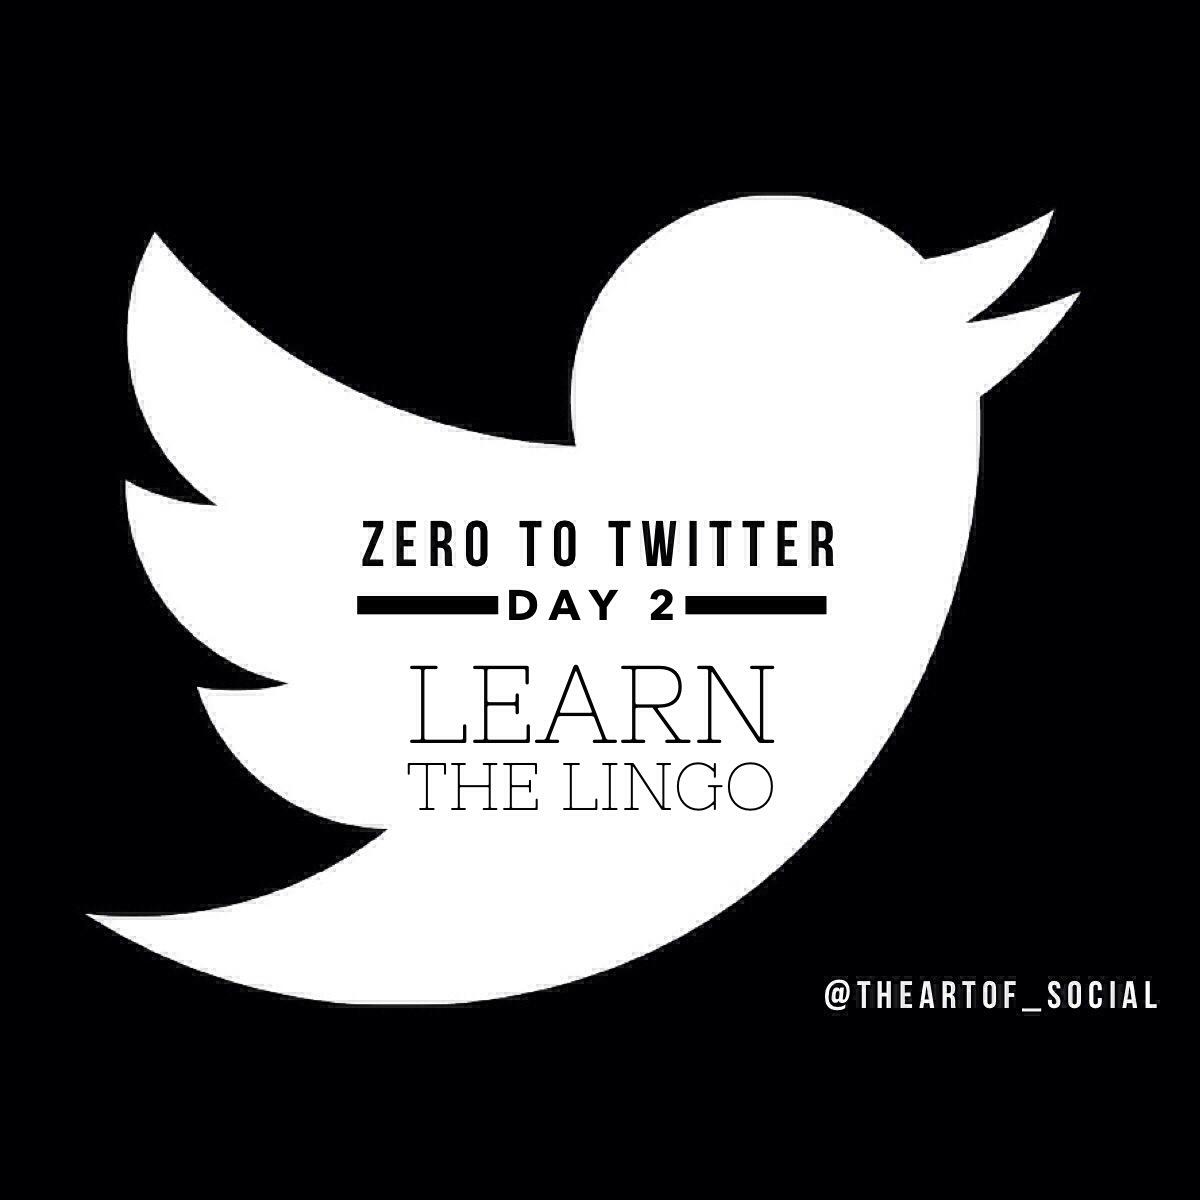 ZeroToTwitterDay3_Learn-The-Lingo.jpg